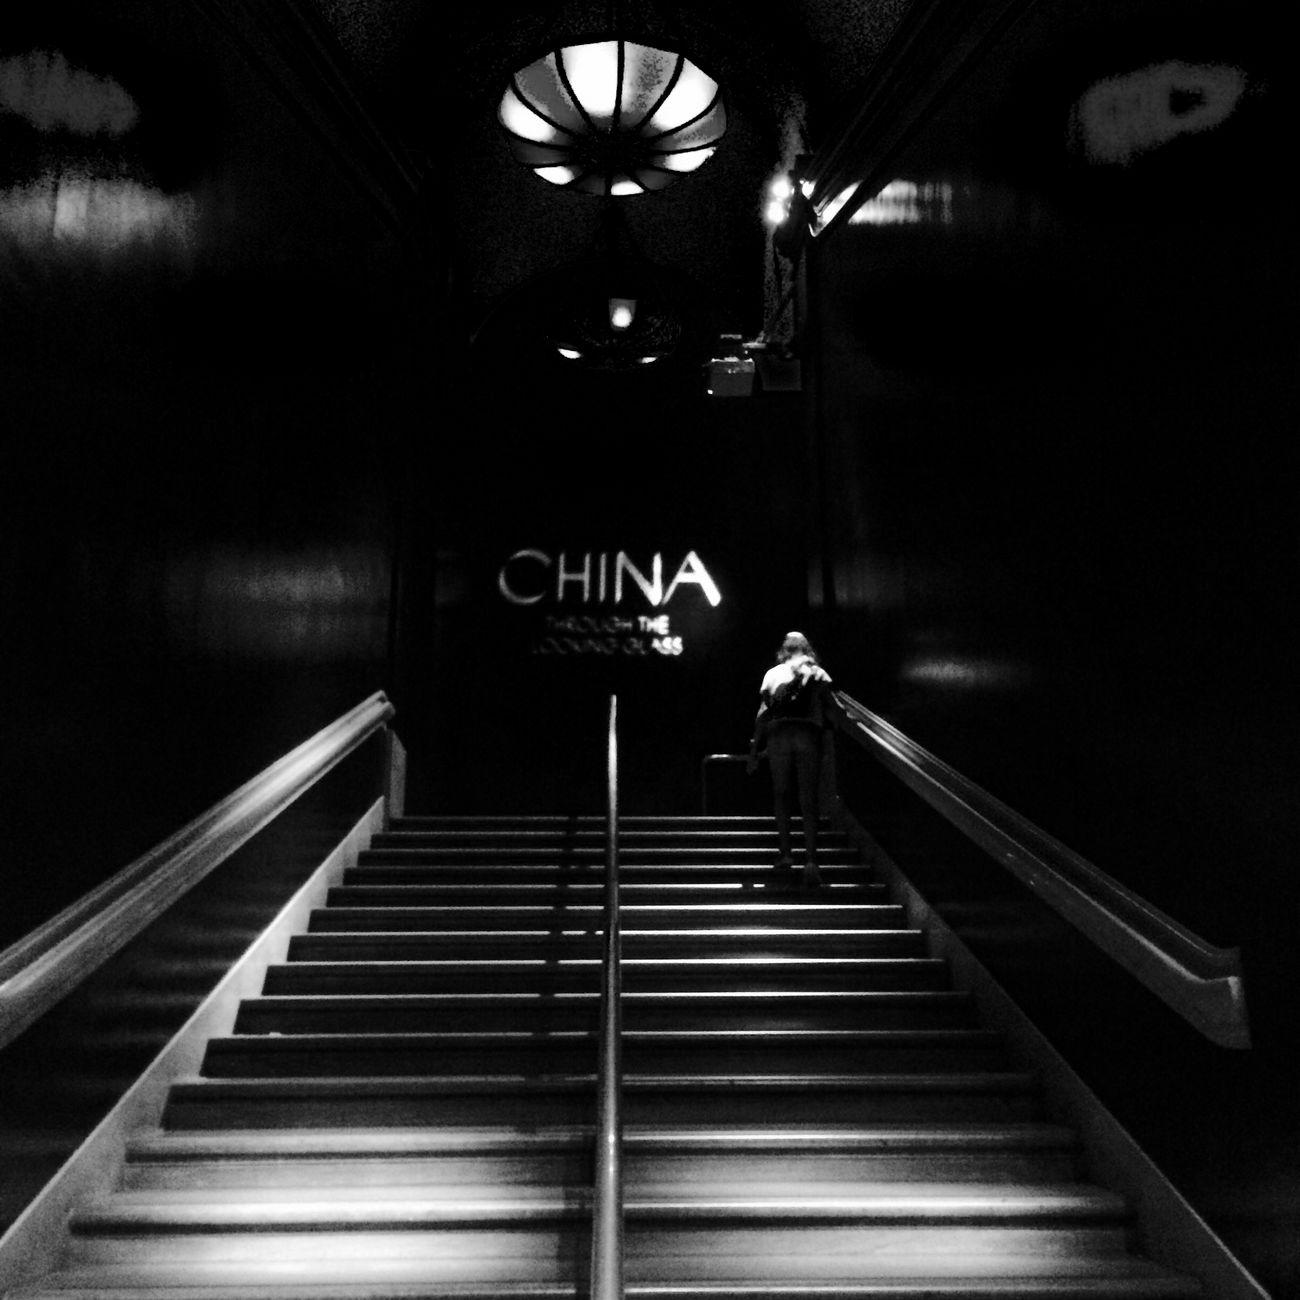 China NYC Blackandwhite Black & White Eye4thestreets Street Streetphotography IPhone IPhoneography Black And White Eye4black&white  Street Photography Streetphoto_bw Streetphotography_bw Eye4photography  Monochrome EyeEm Best Shots - Black + White